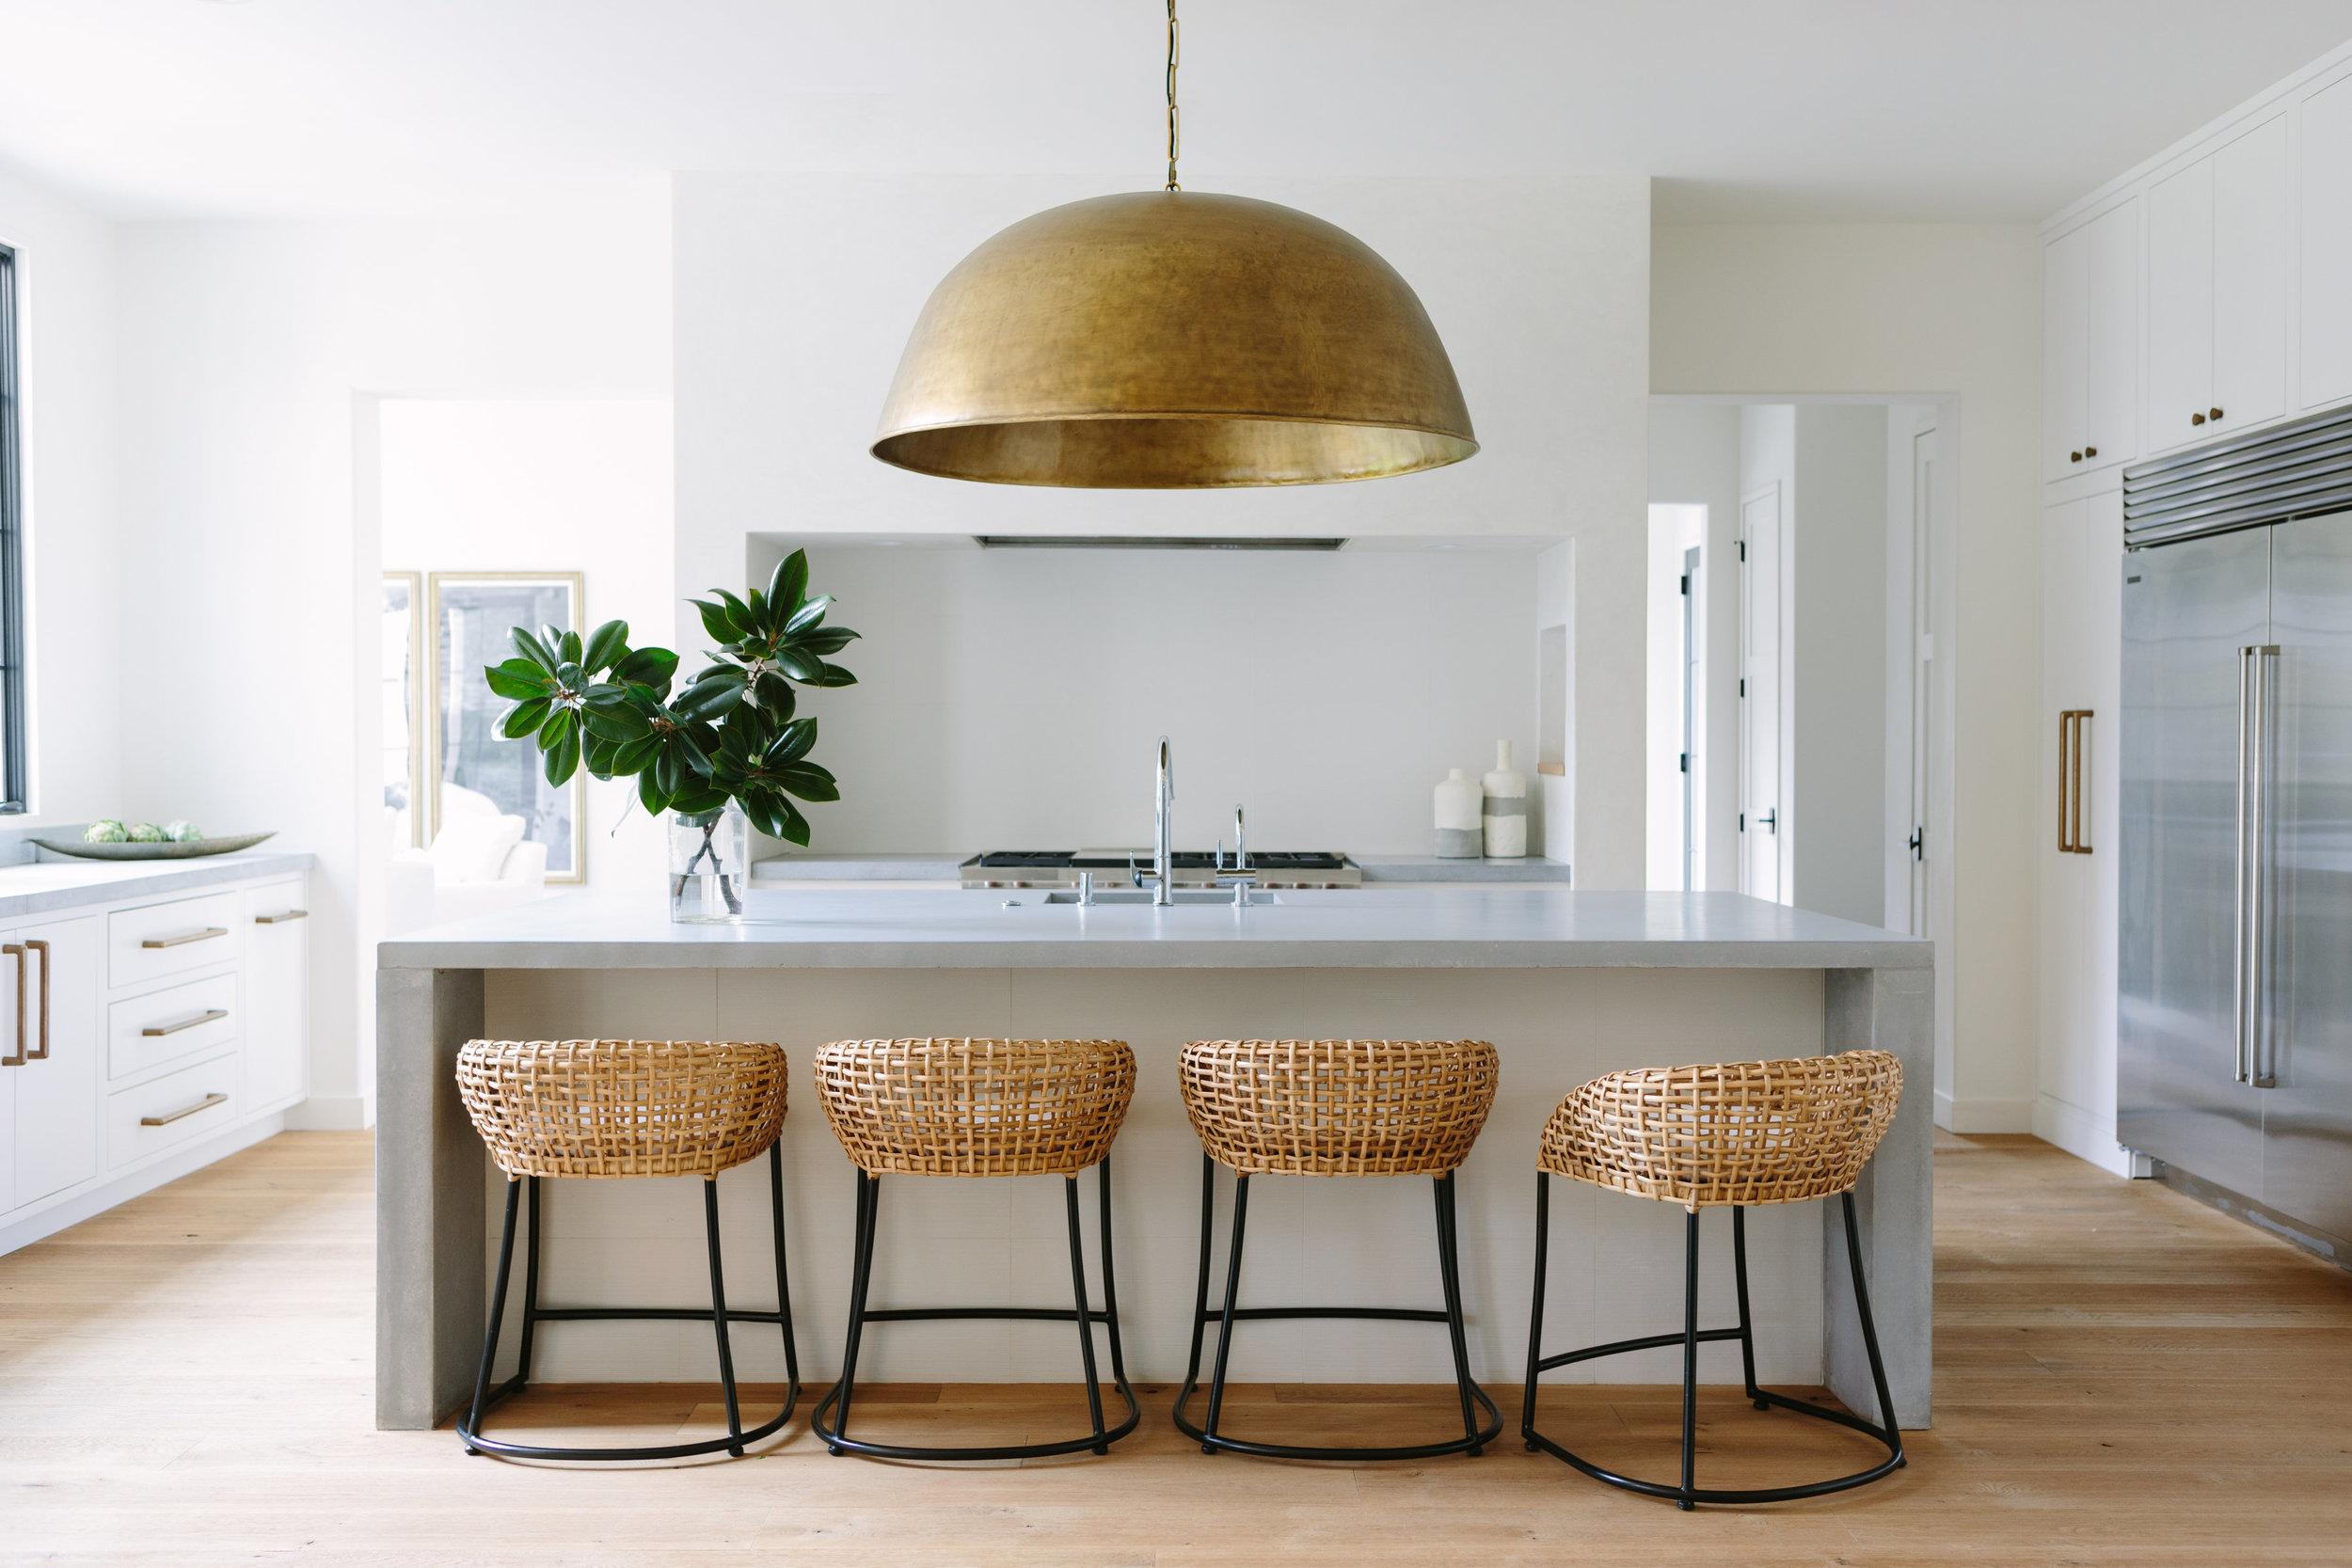 Image/Design Via Mitzi Maynord Interiors